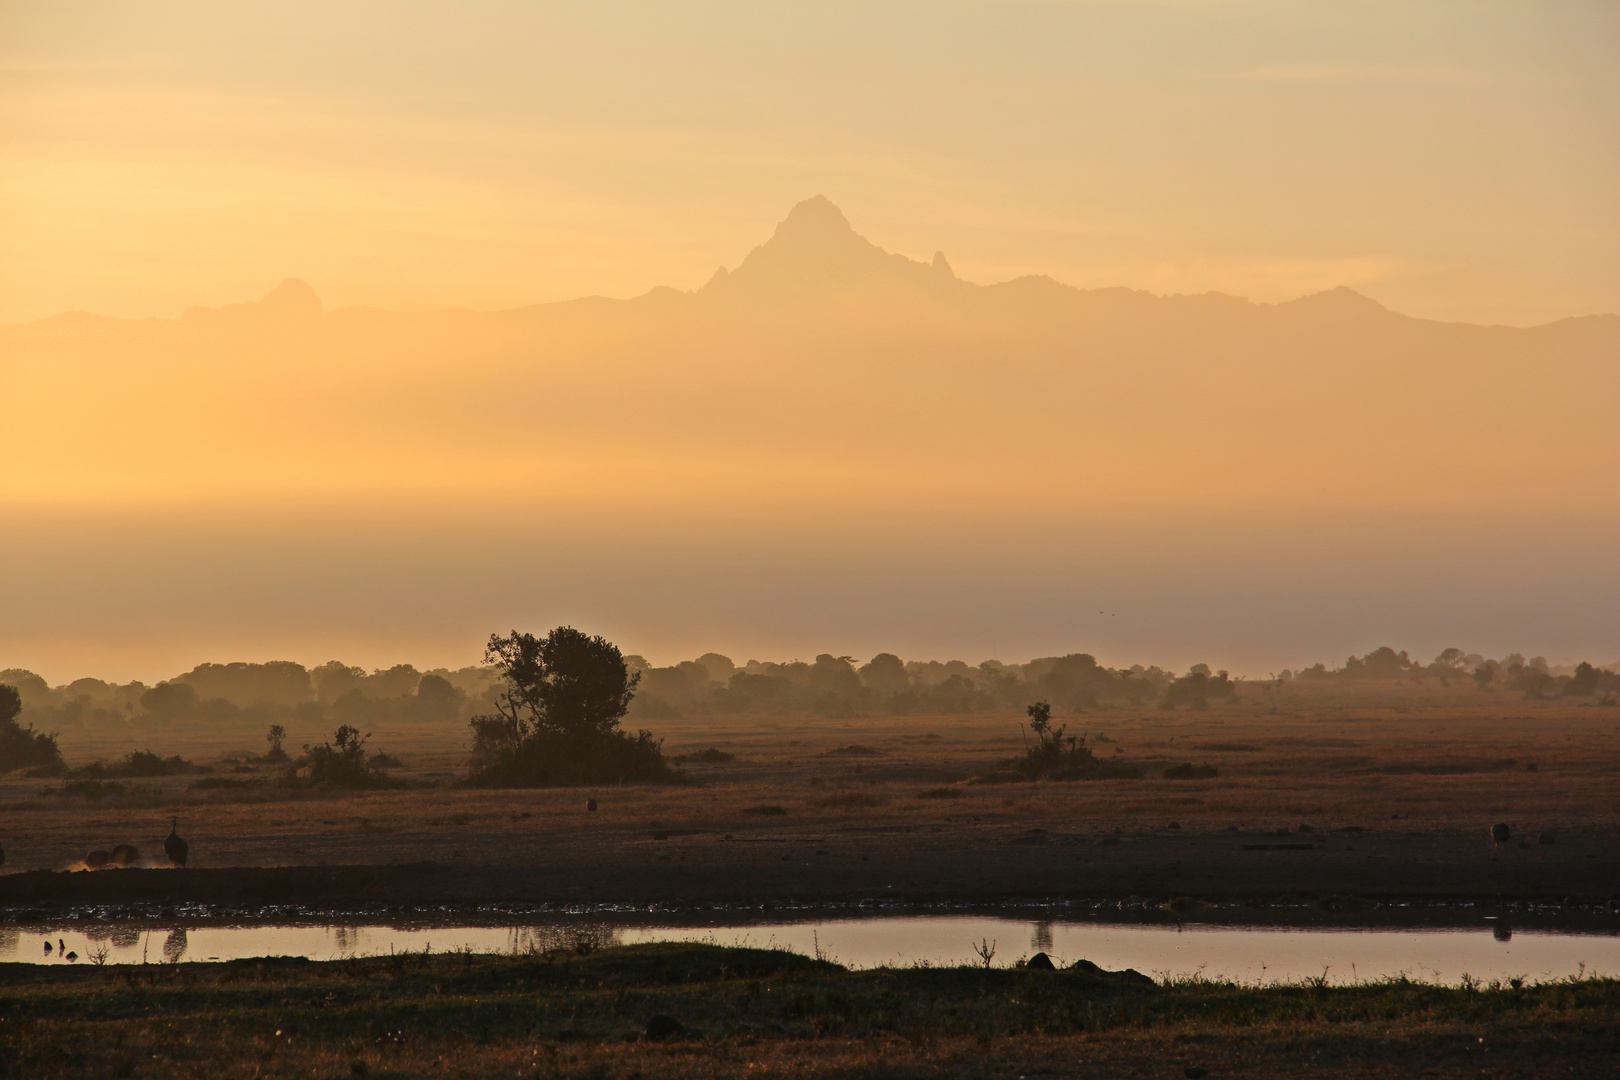 Mount Kenya Massiv ganz früh am Morgen.